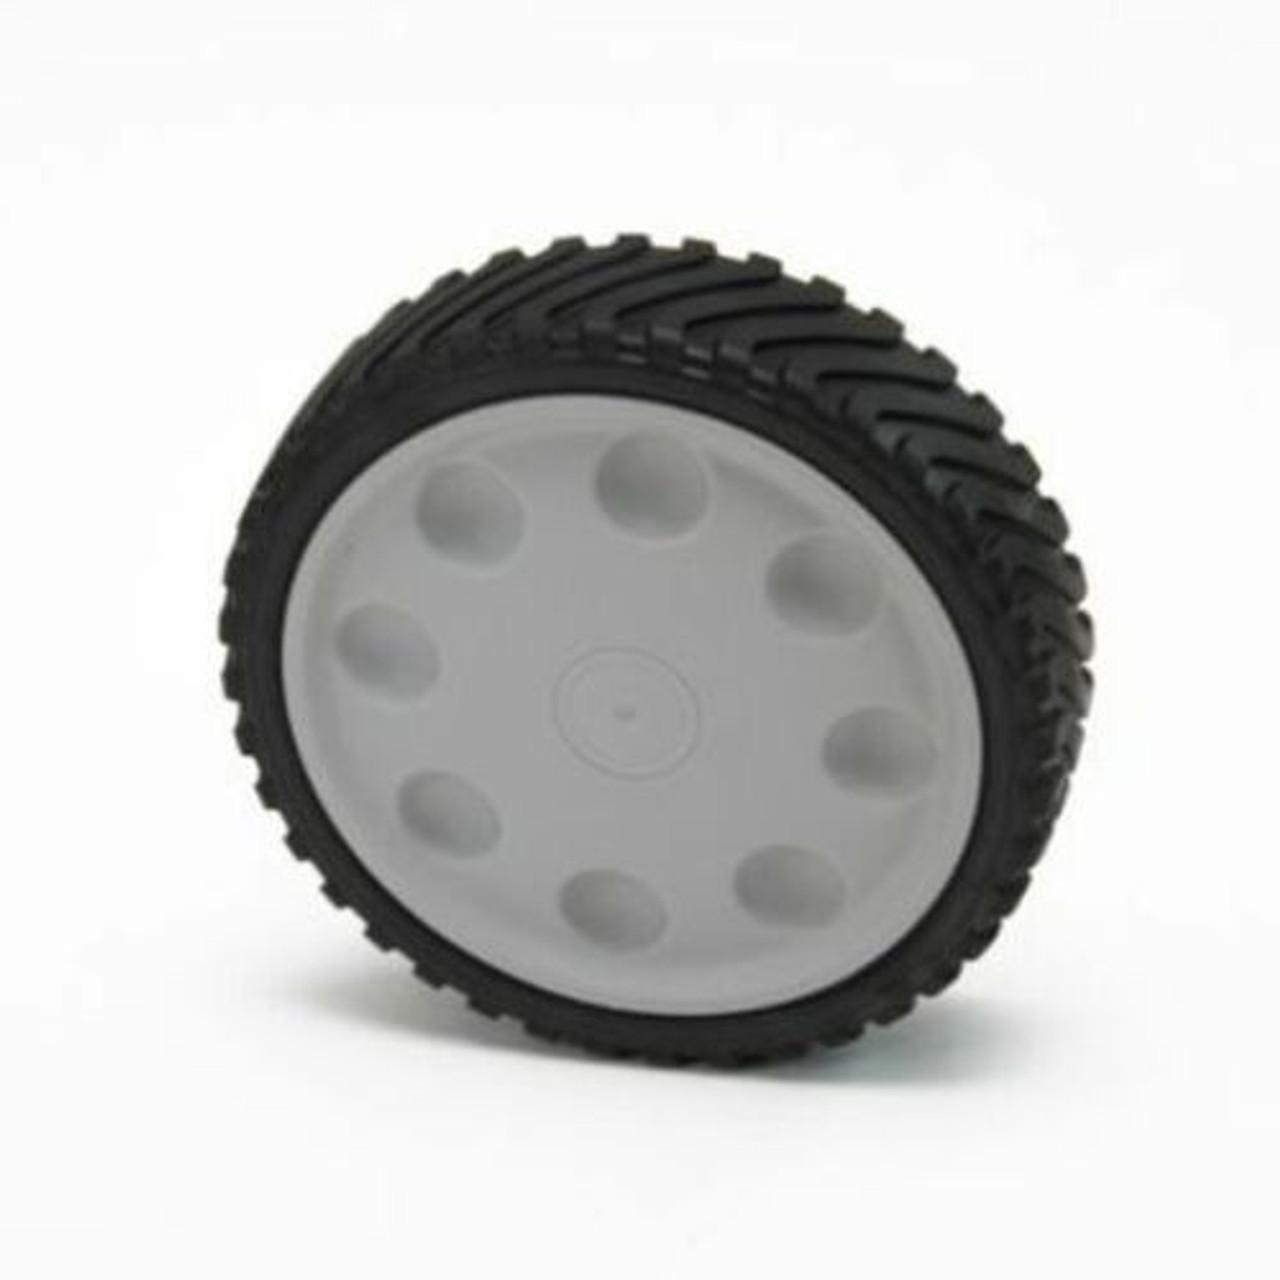 New MTD and Troy Bilt OEM Wheel 753-08091